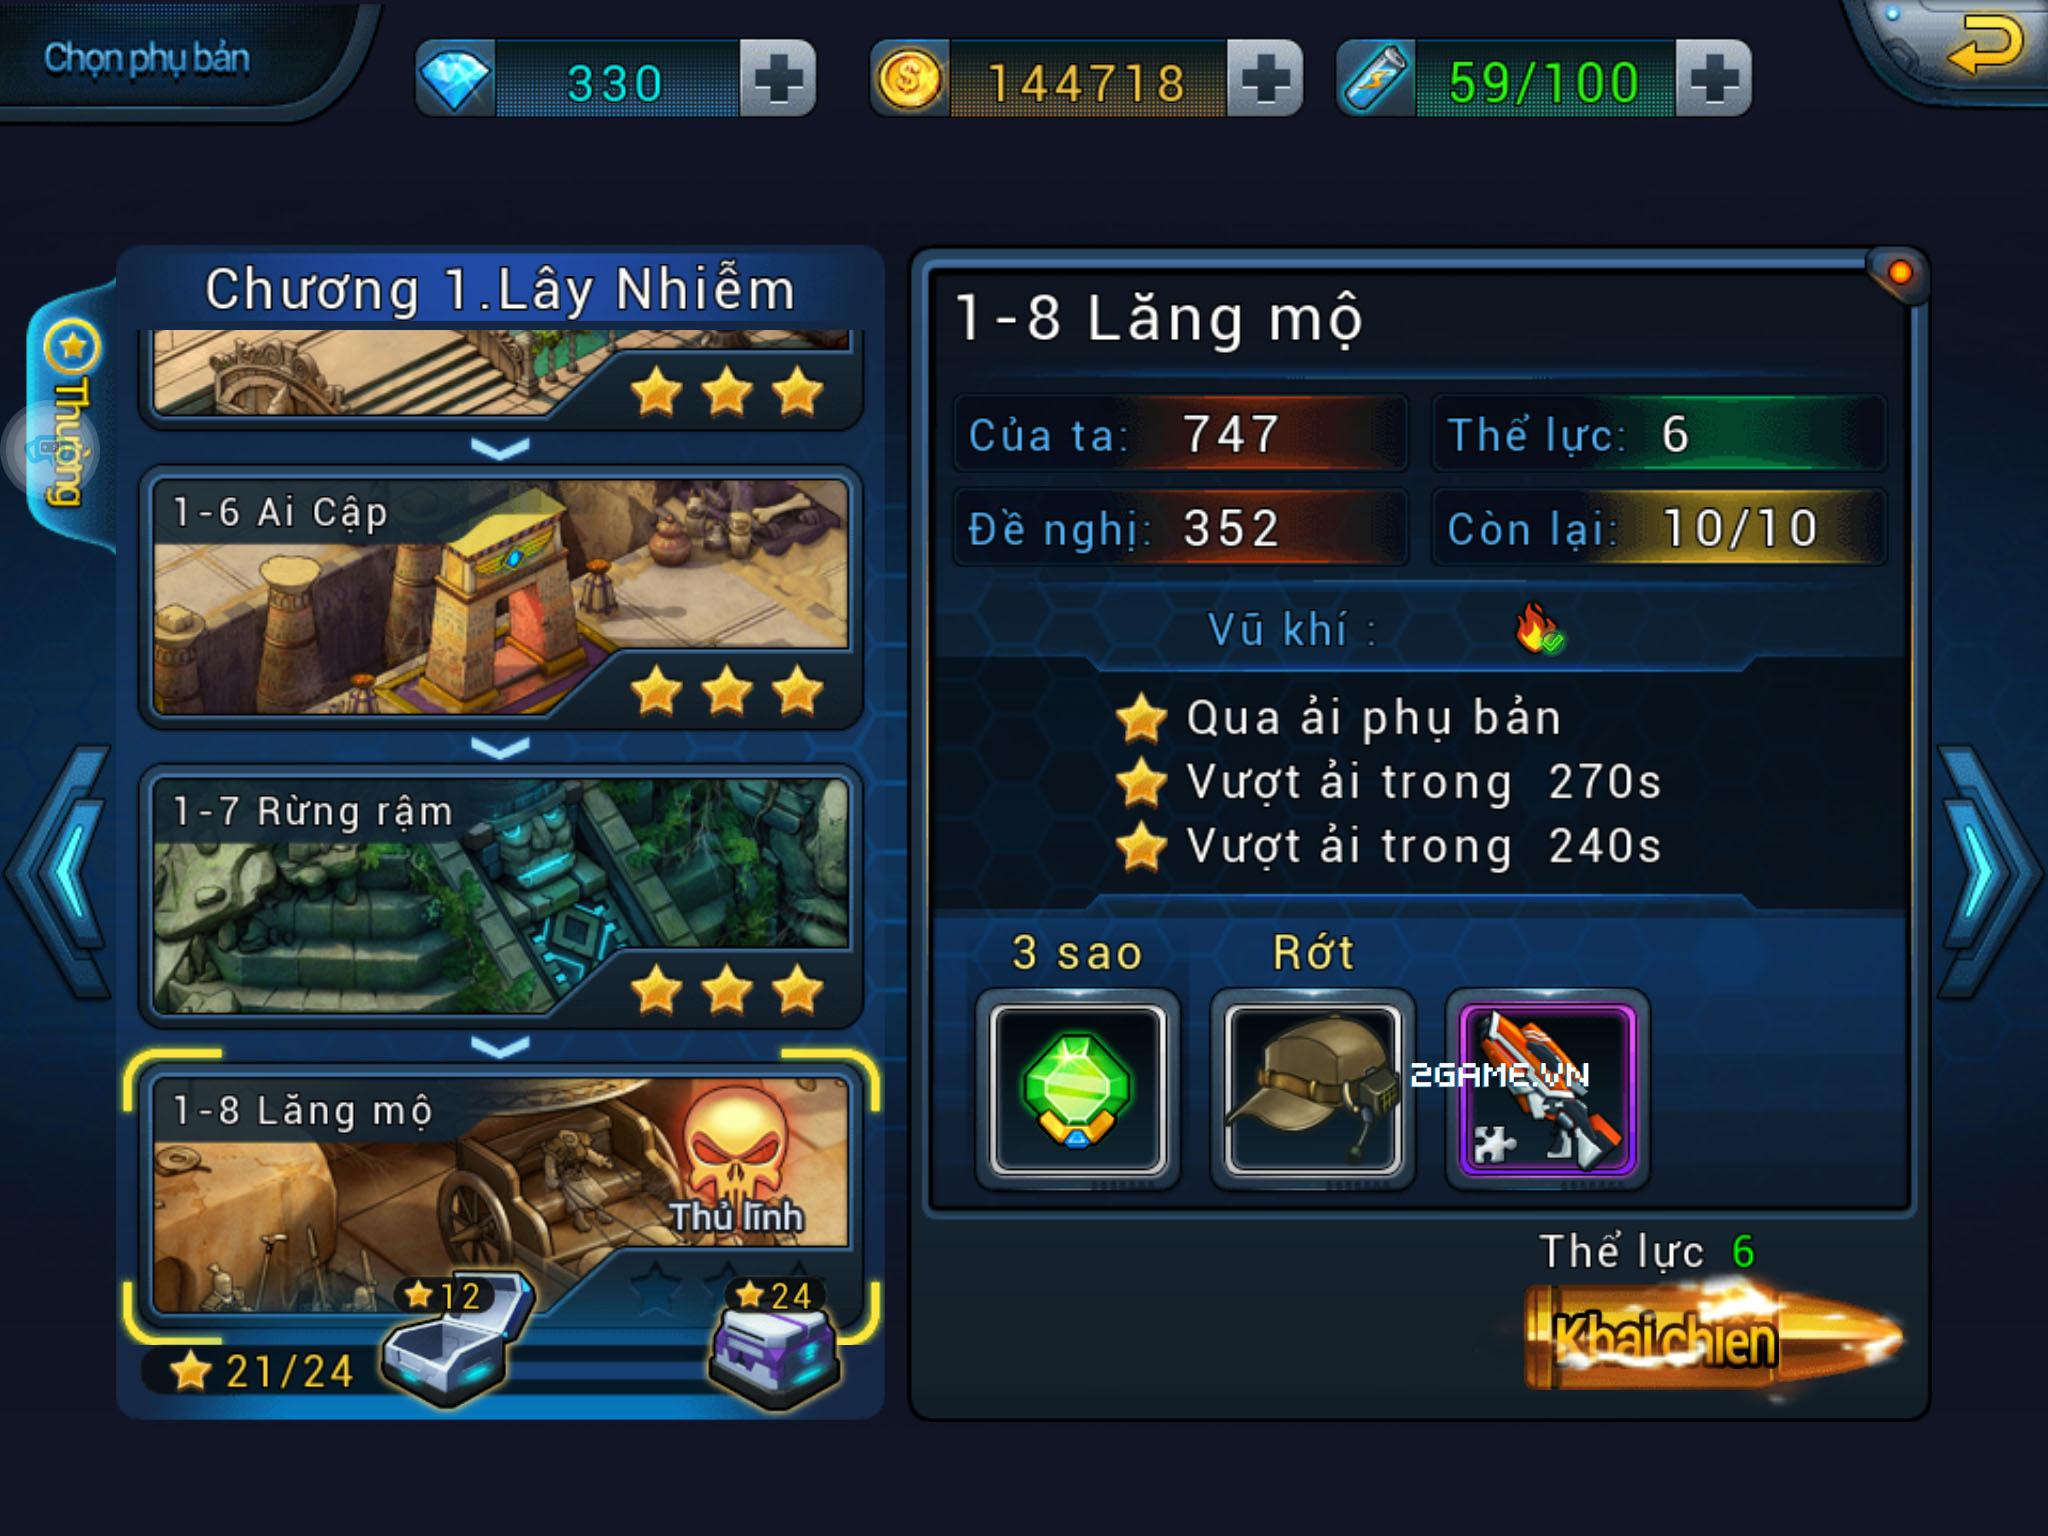 2game_trai_nghiem_avengers_huyen_thoai_vh_7.jpg (2048×1536)